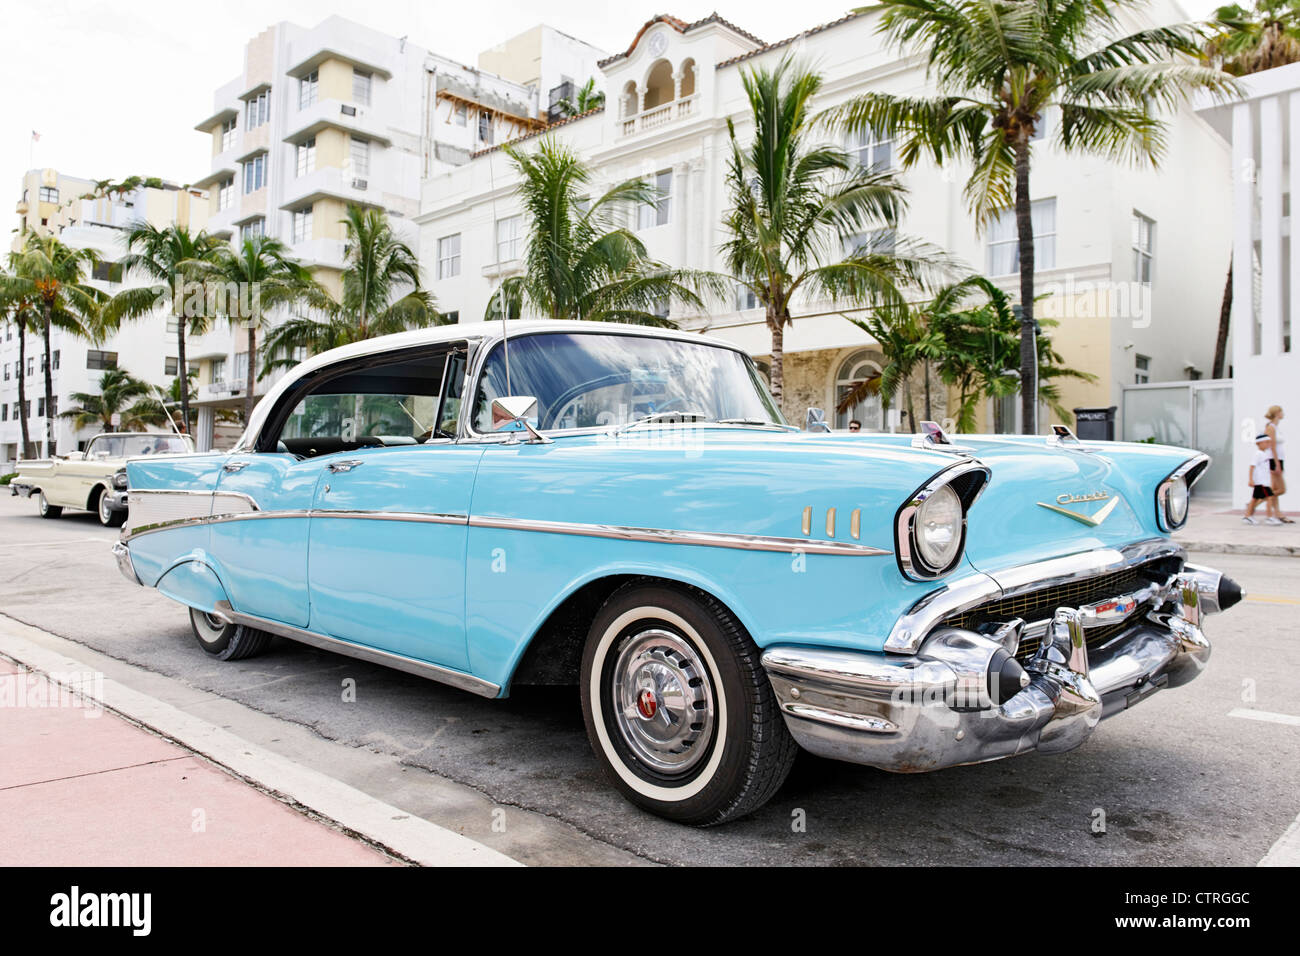 Chevrolet Bel Air Built In Fifties American Classic Cars